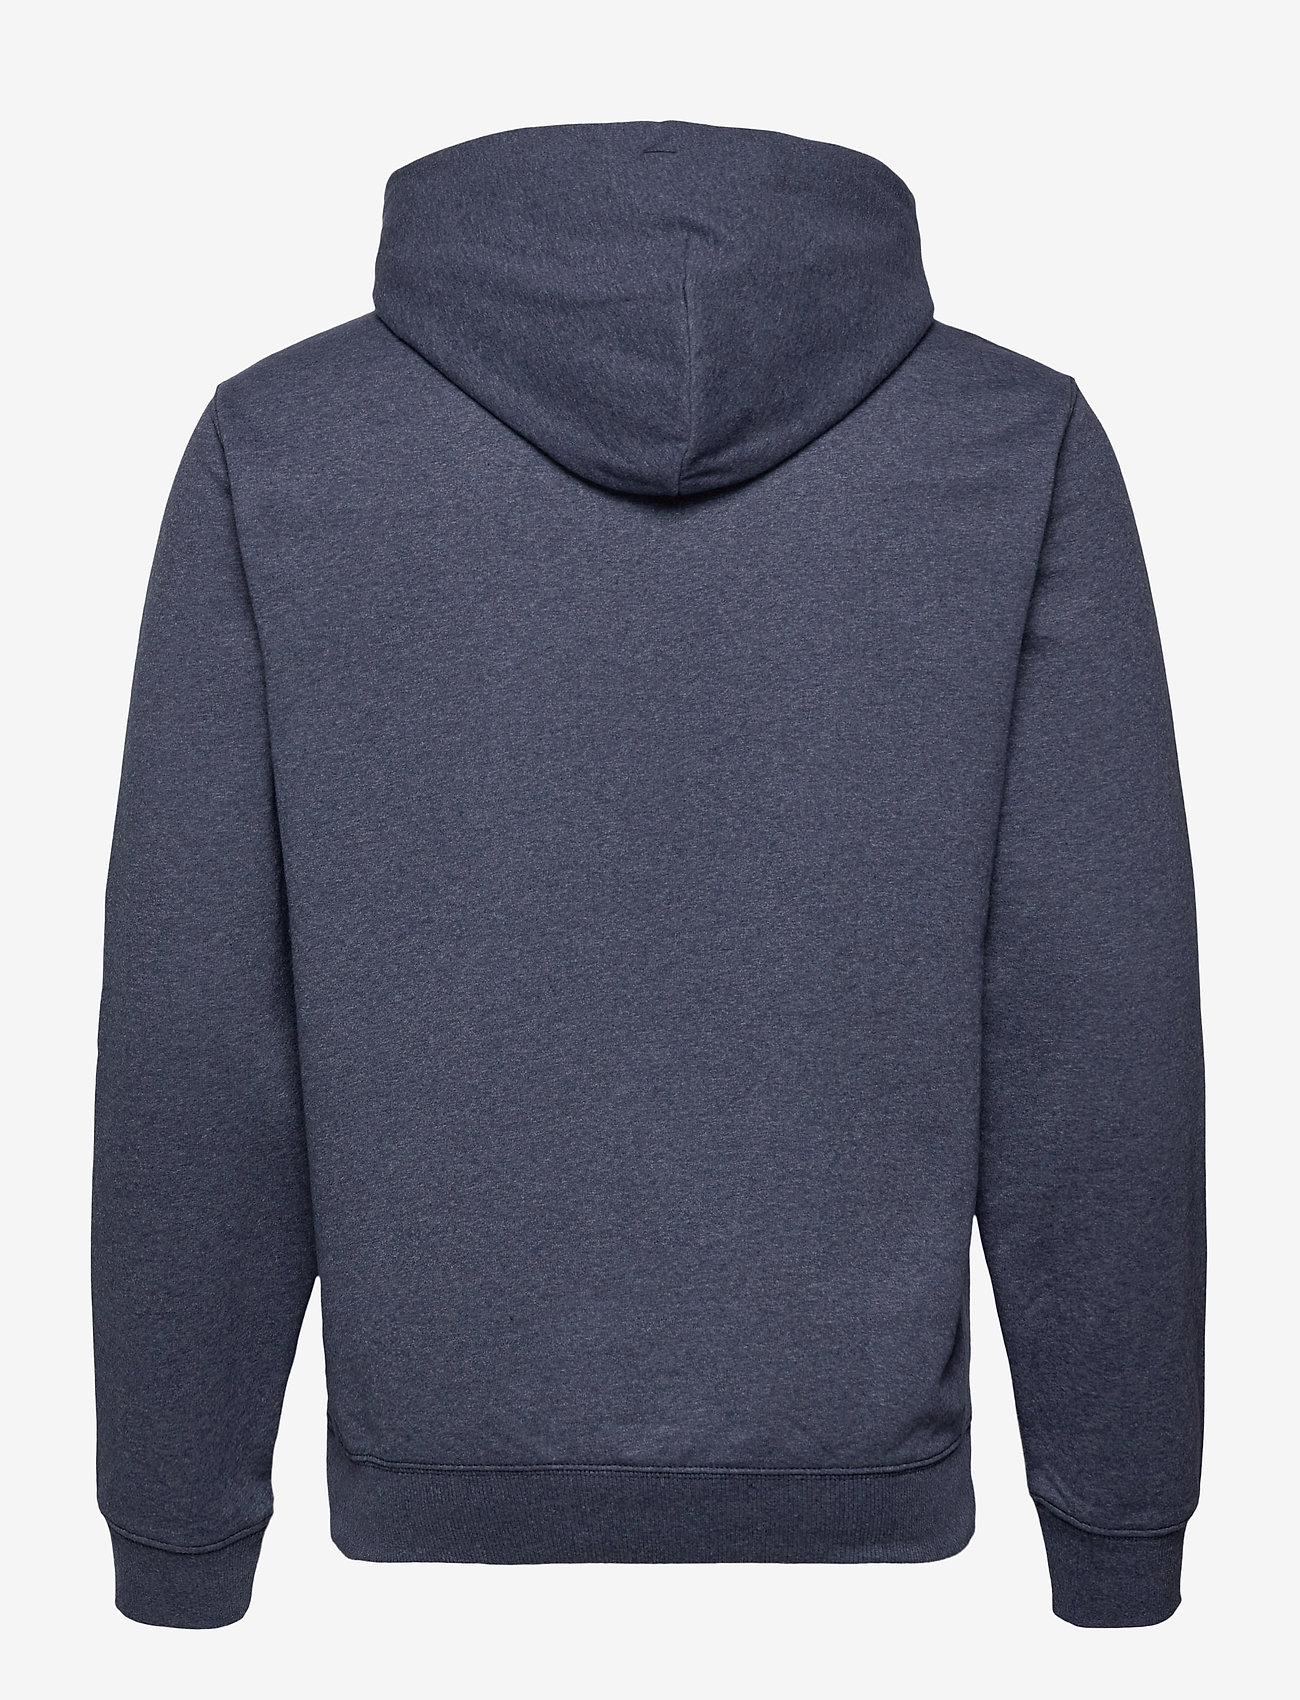 Tommy Jeans - TJM STRAIGHT LOGO HOODIE - basic sweatshirts - twilight navy htr - 1